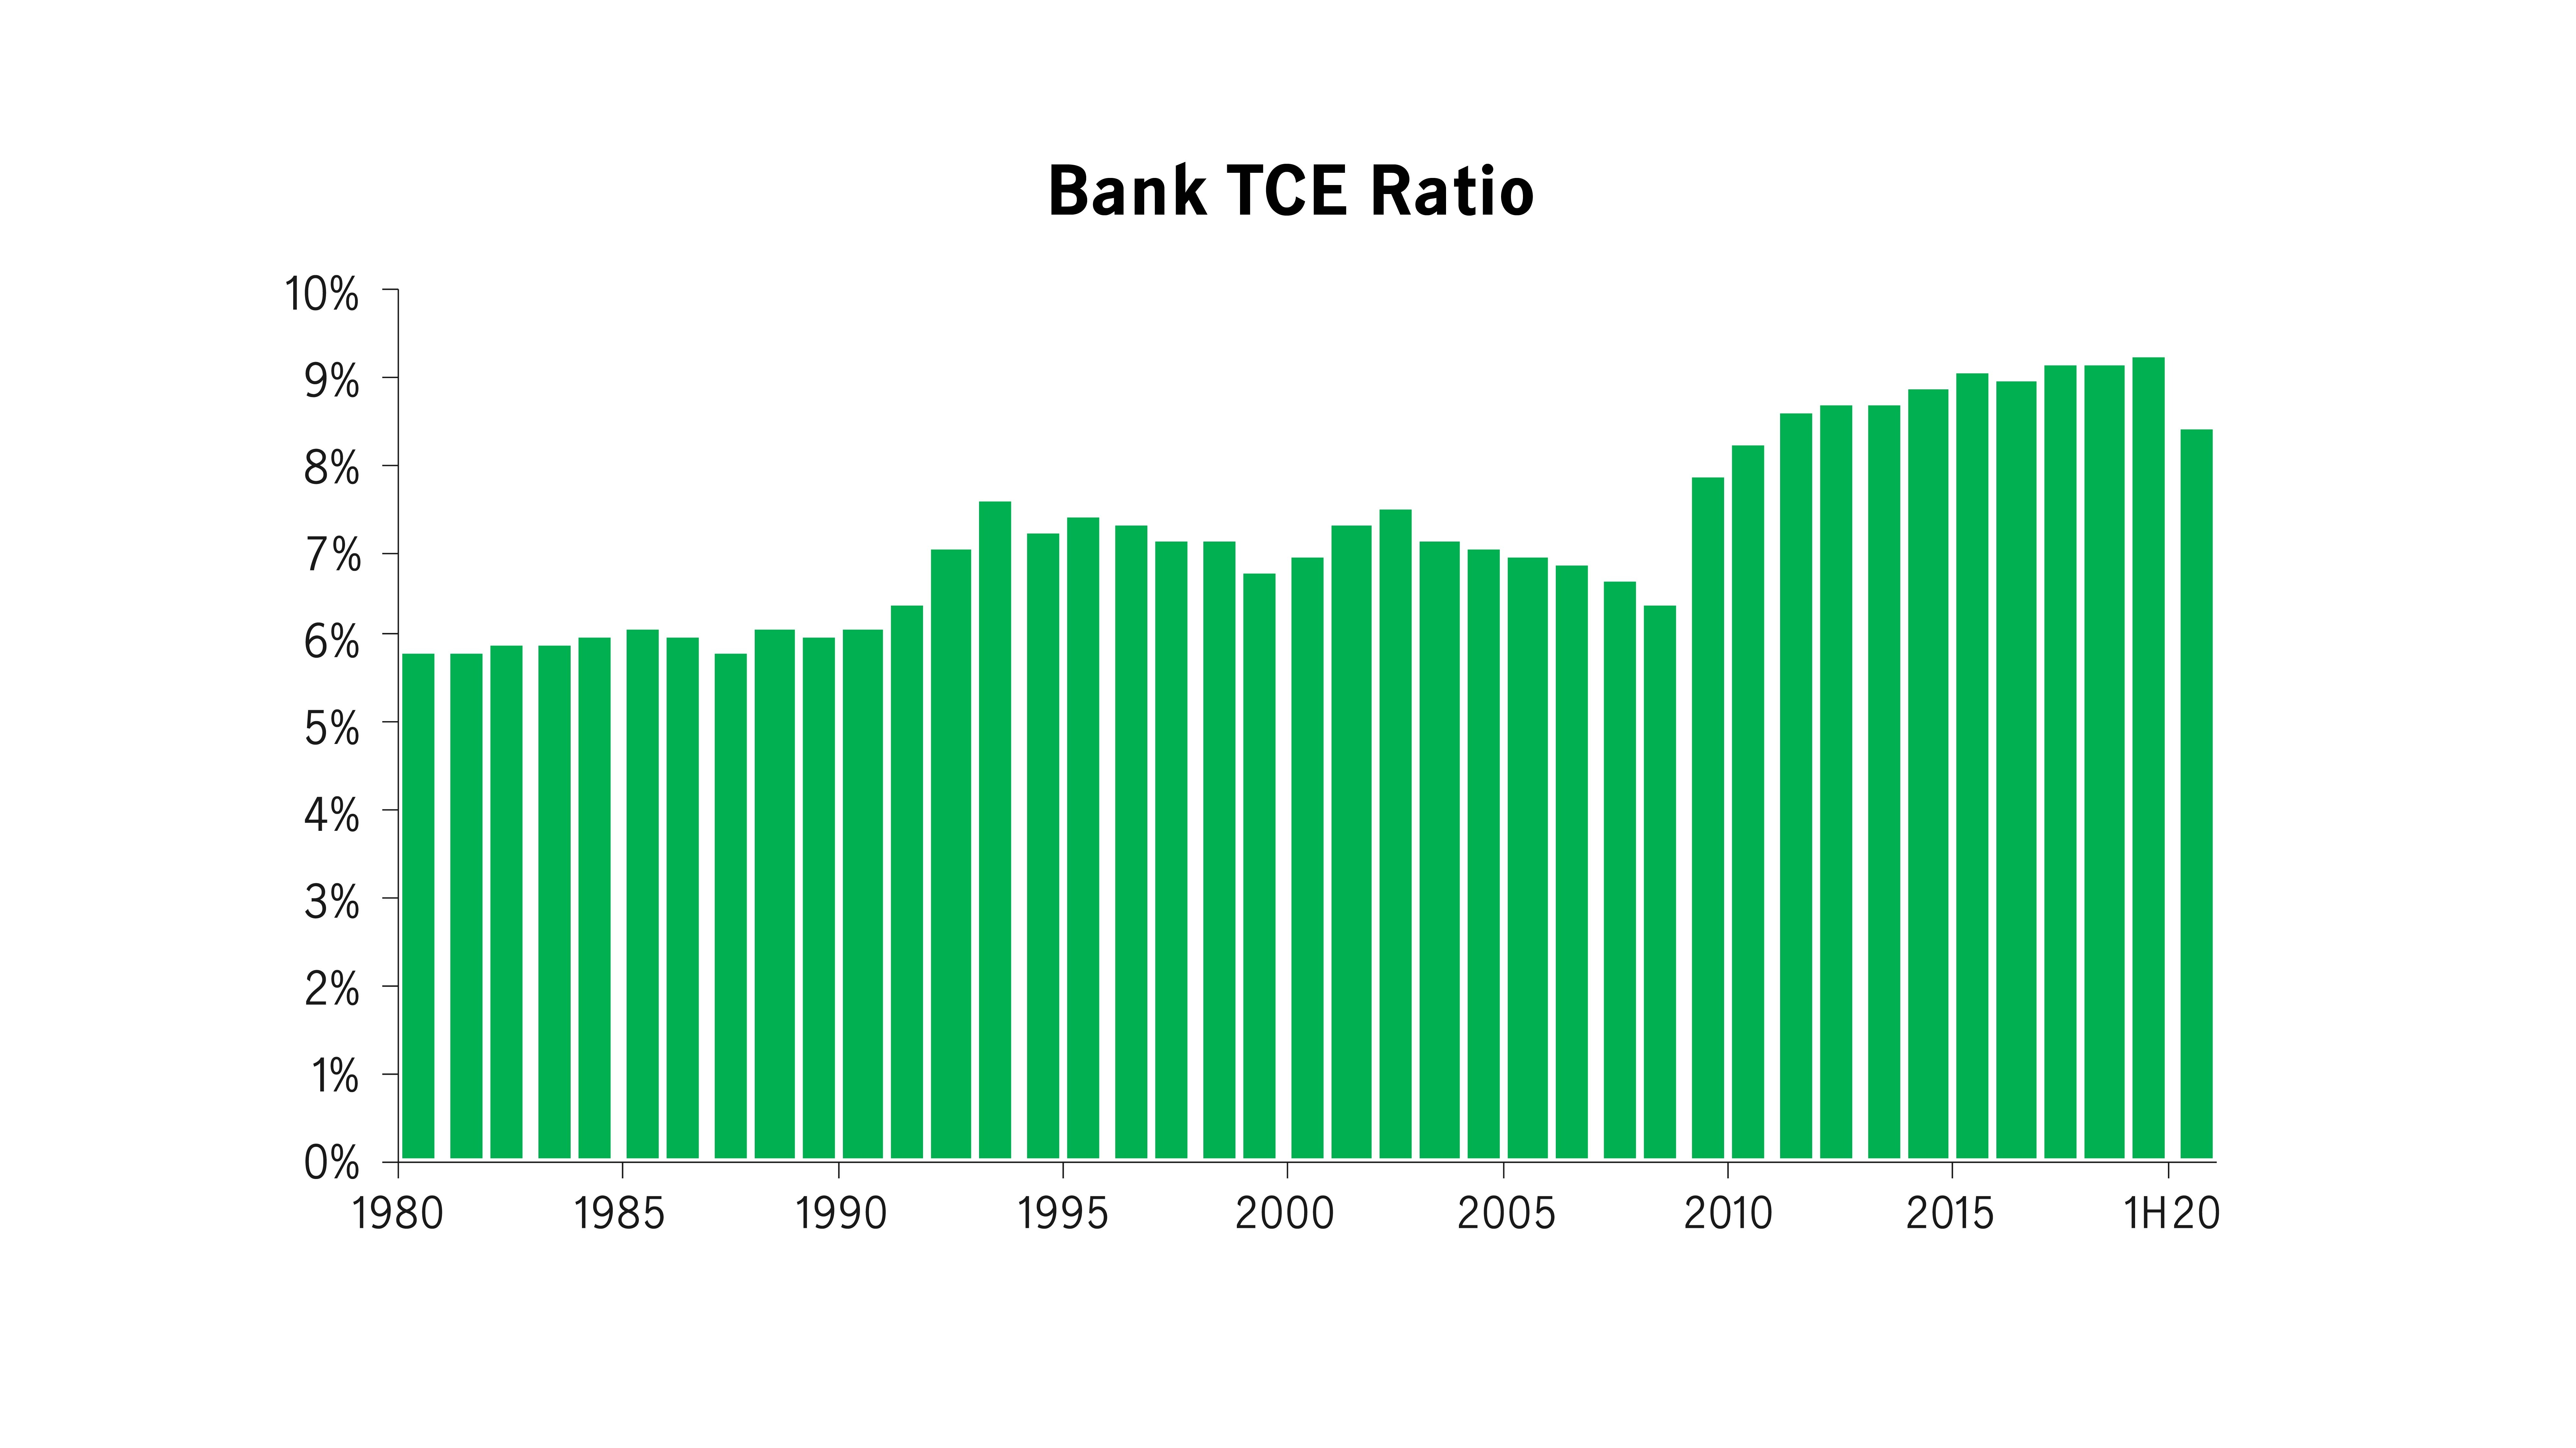 Bank TCE Ratio